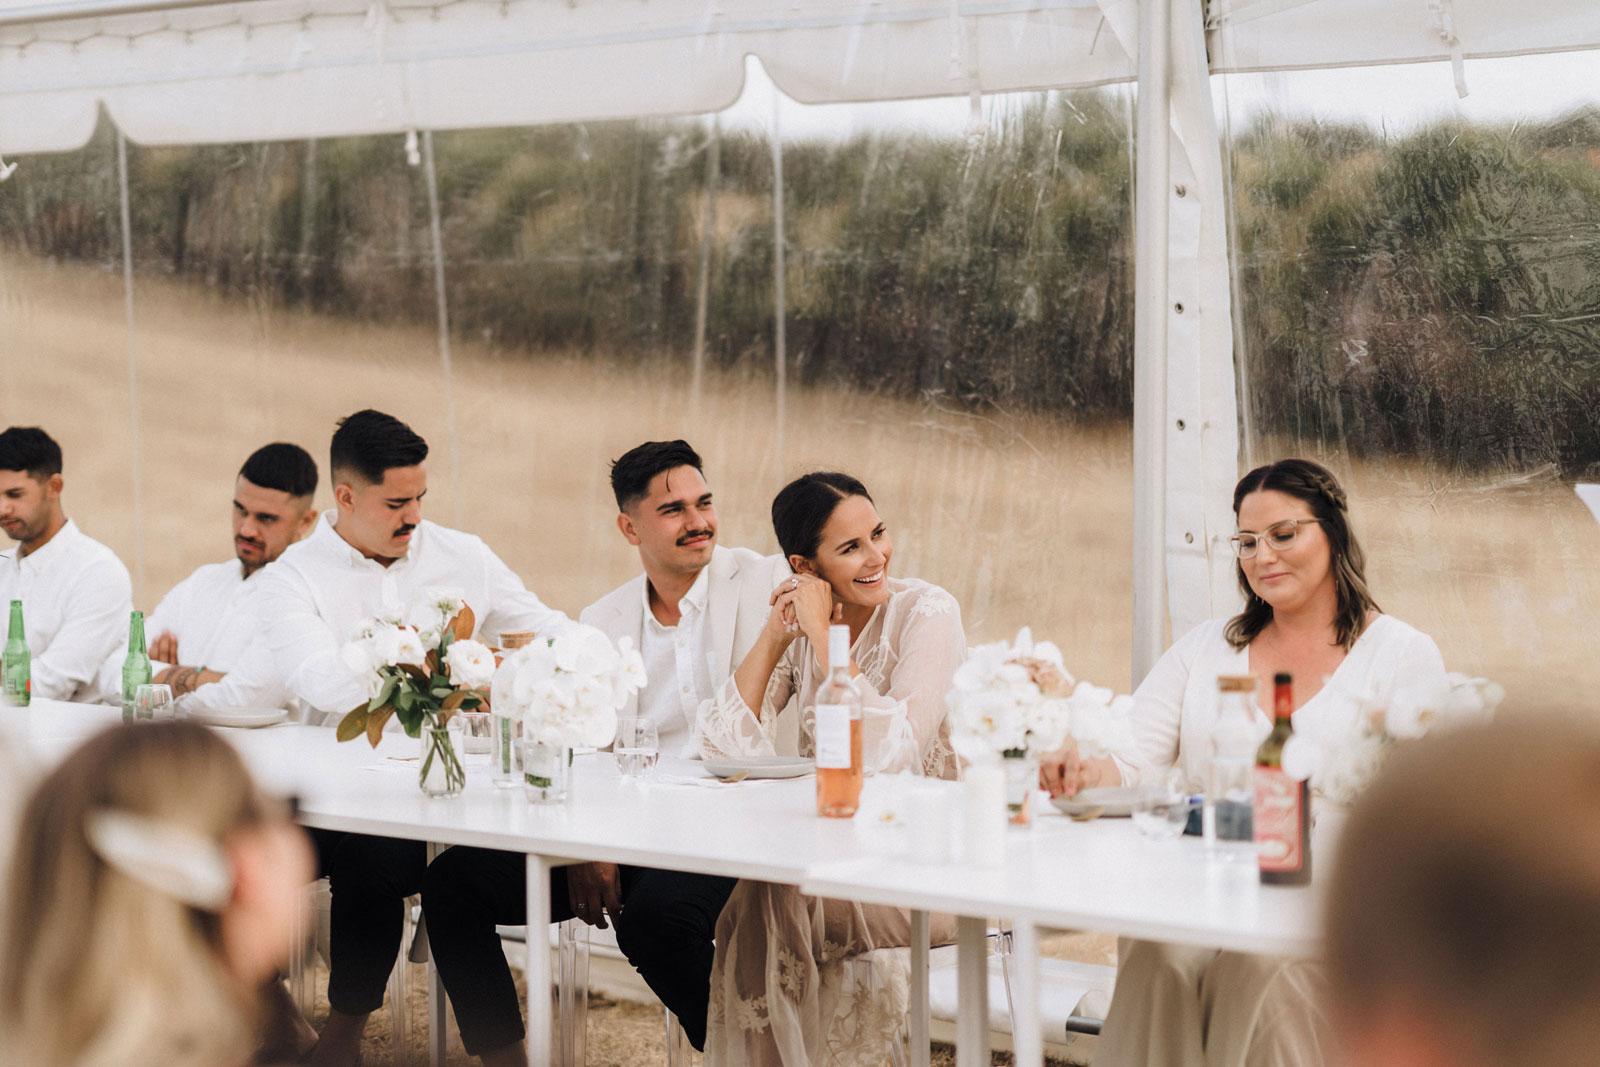 newfound-s-t-hunua-auckland-wedding-photographers-076